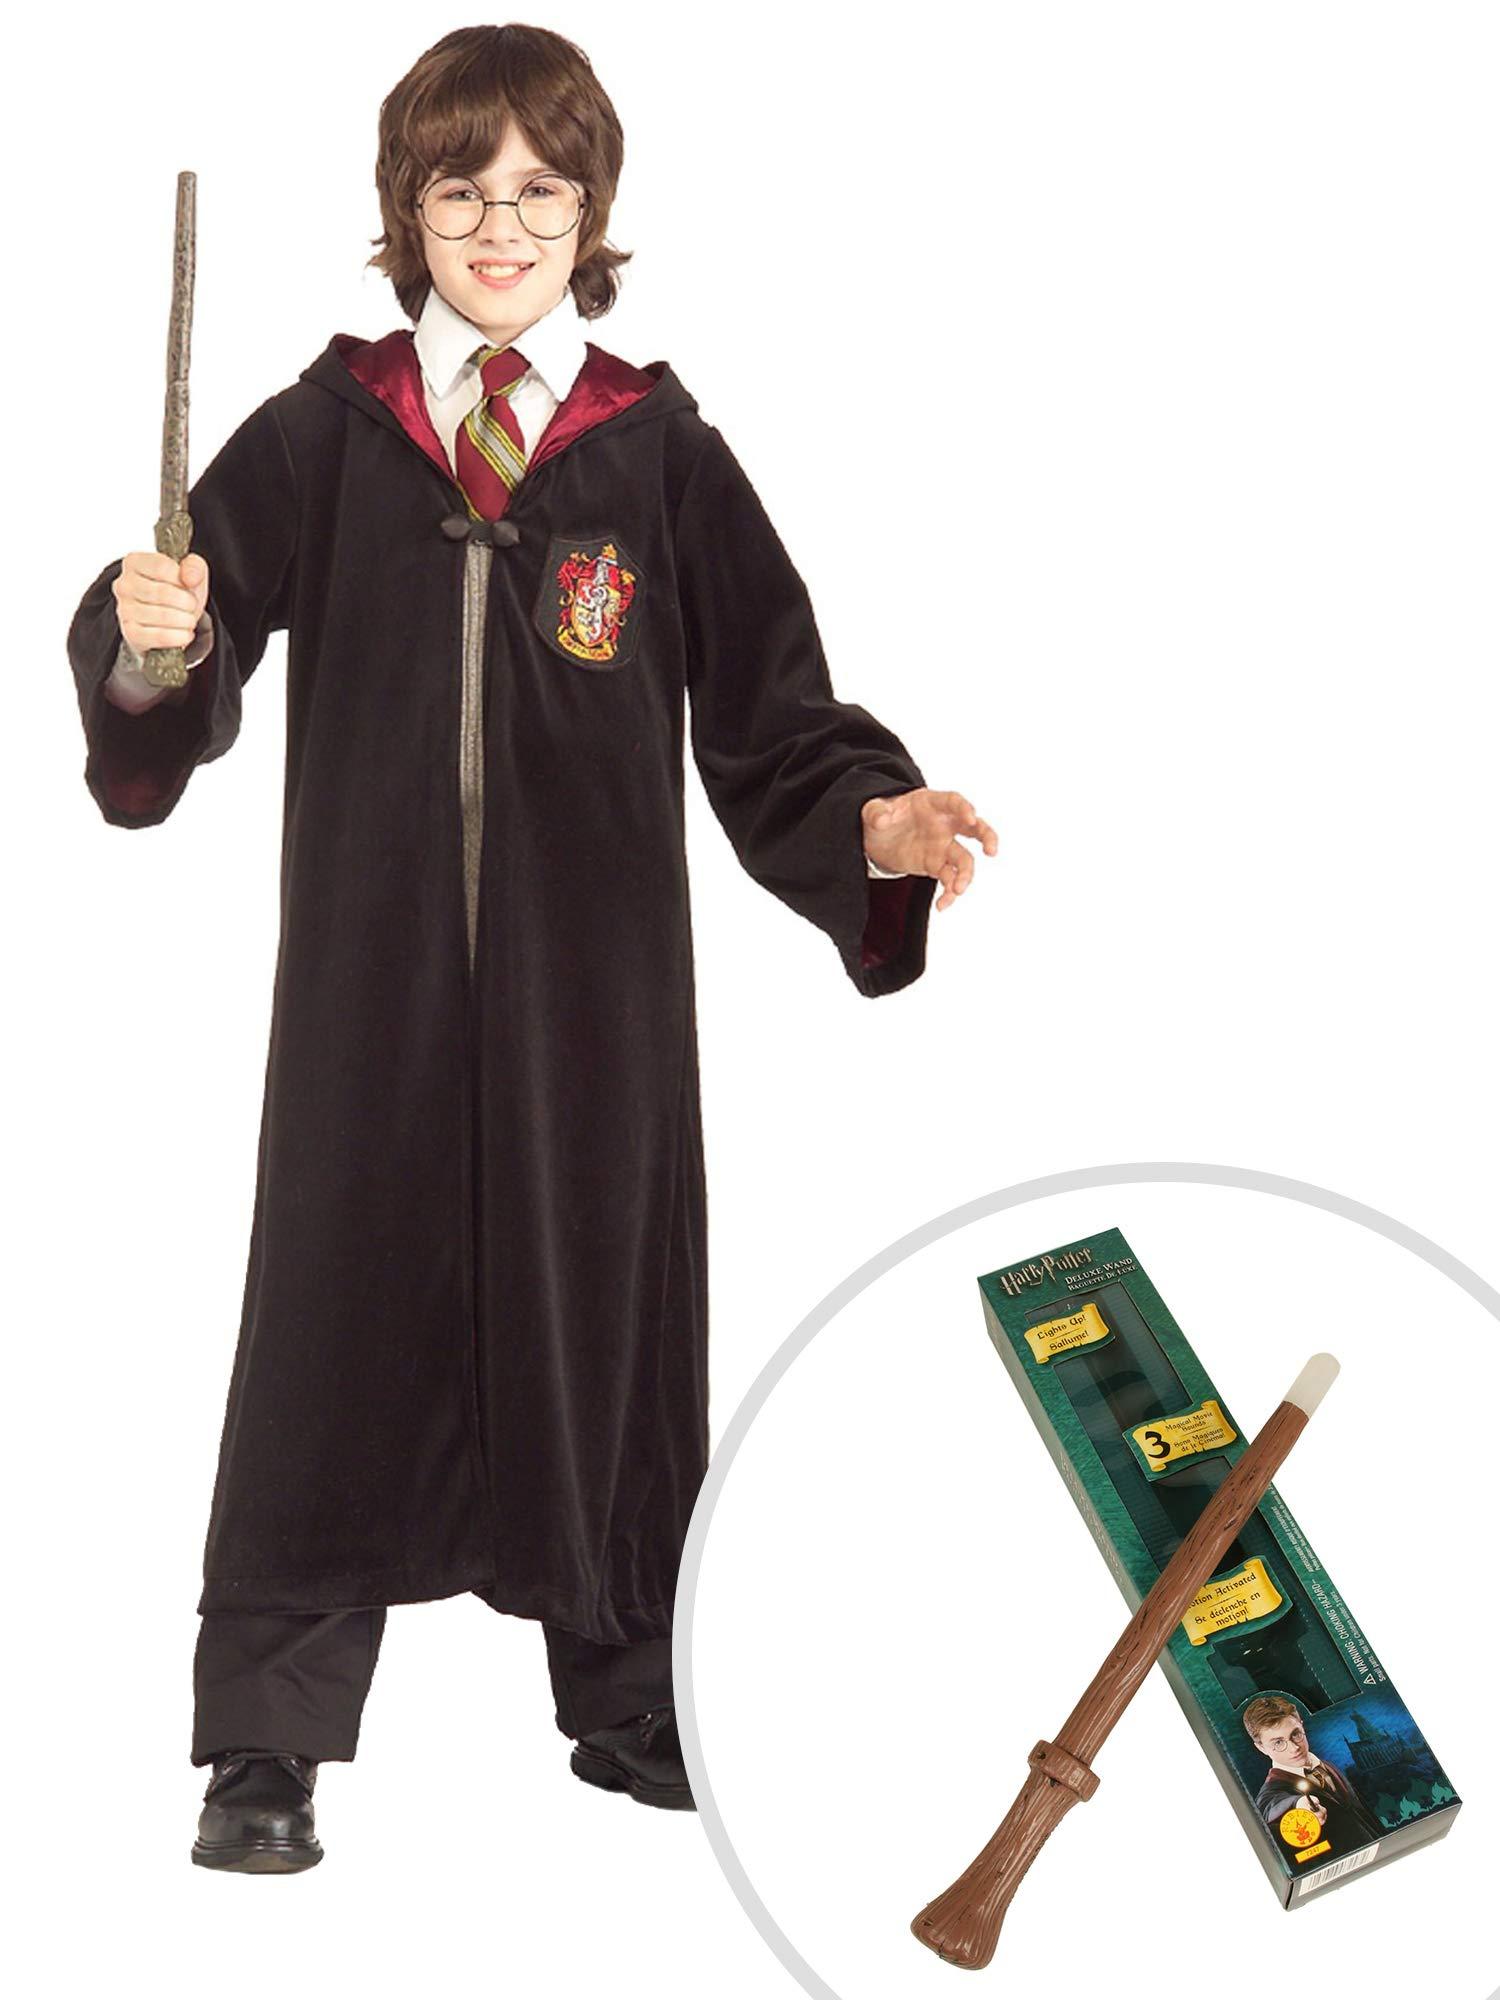 Harry Potter Gryffindor Costume Kit Kids Medium Premium Robe With Magical Wand